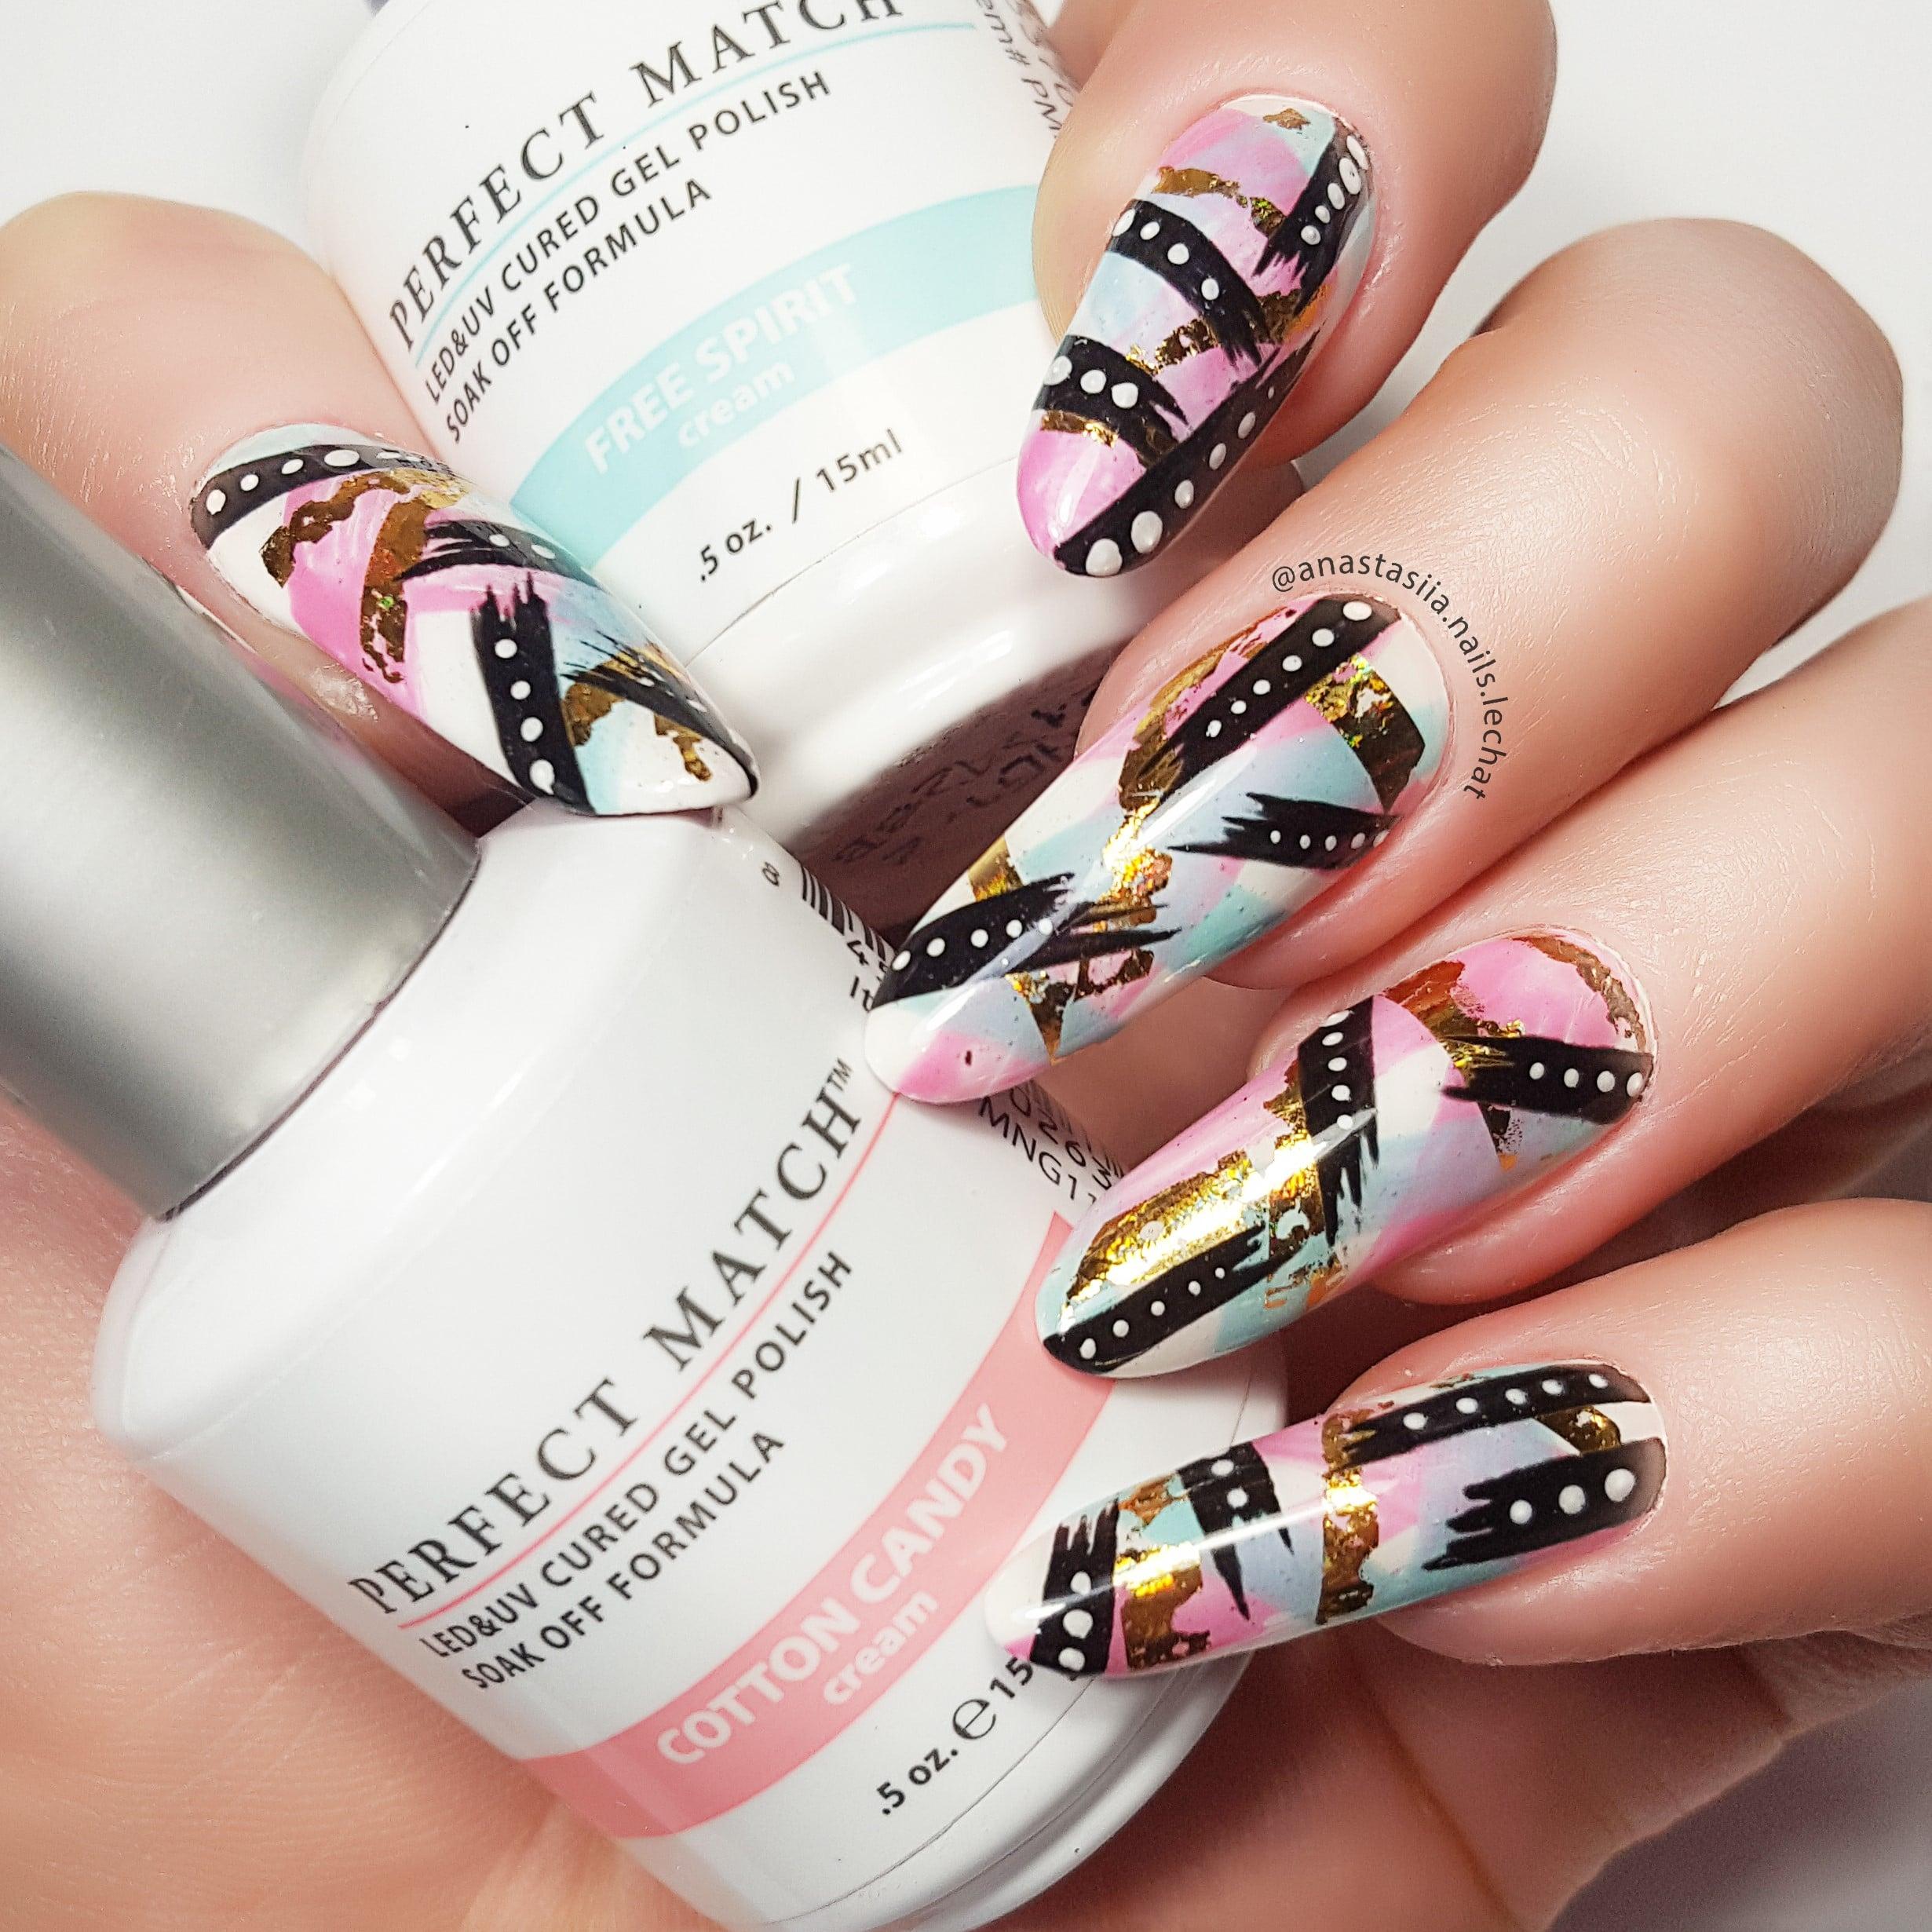 Perfect Match nail art using cotton candy and free spirit